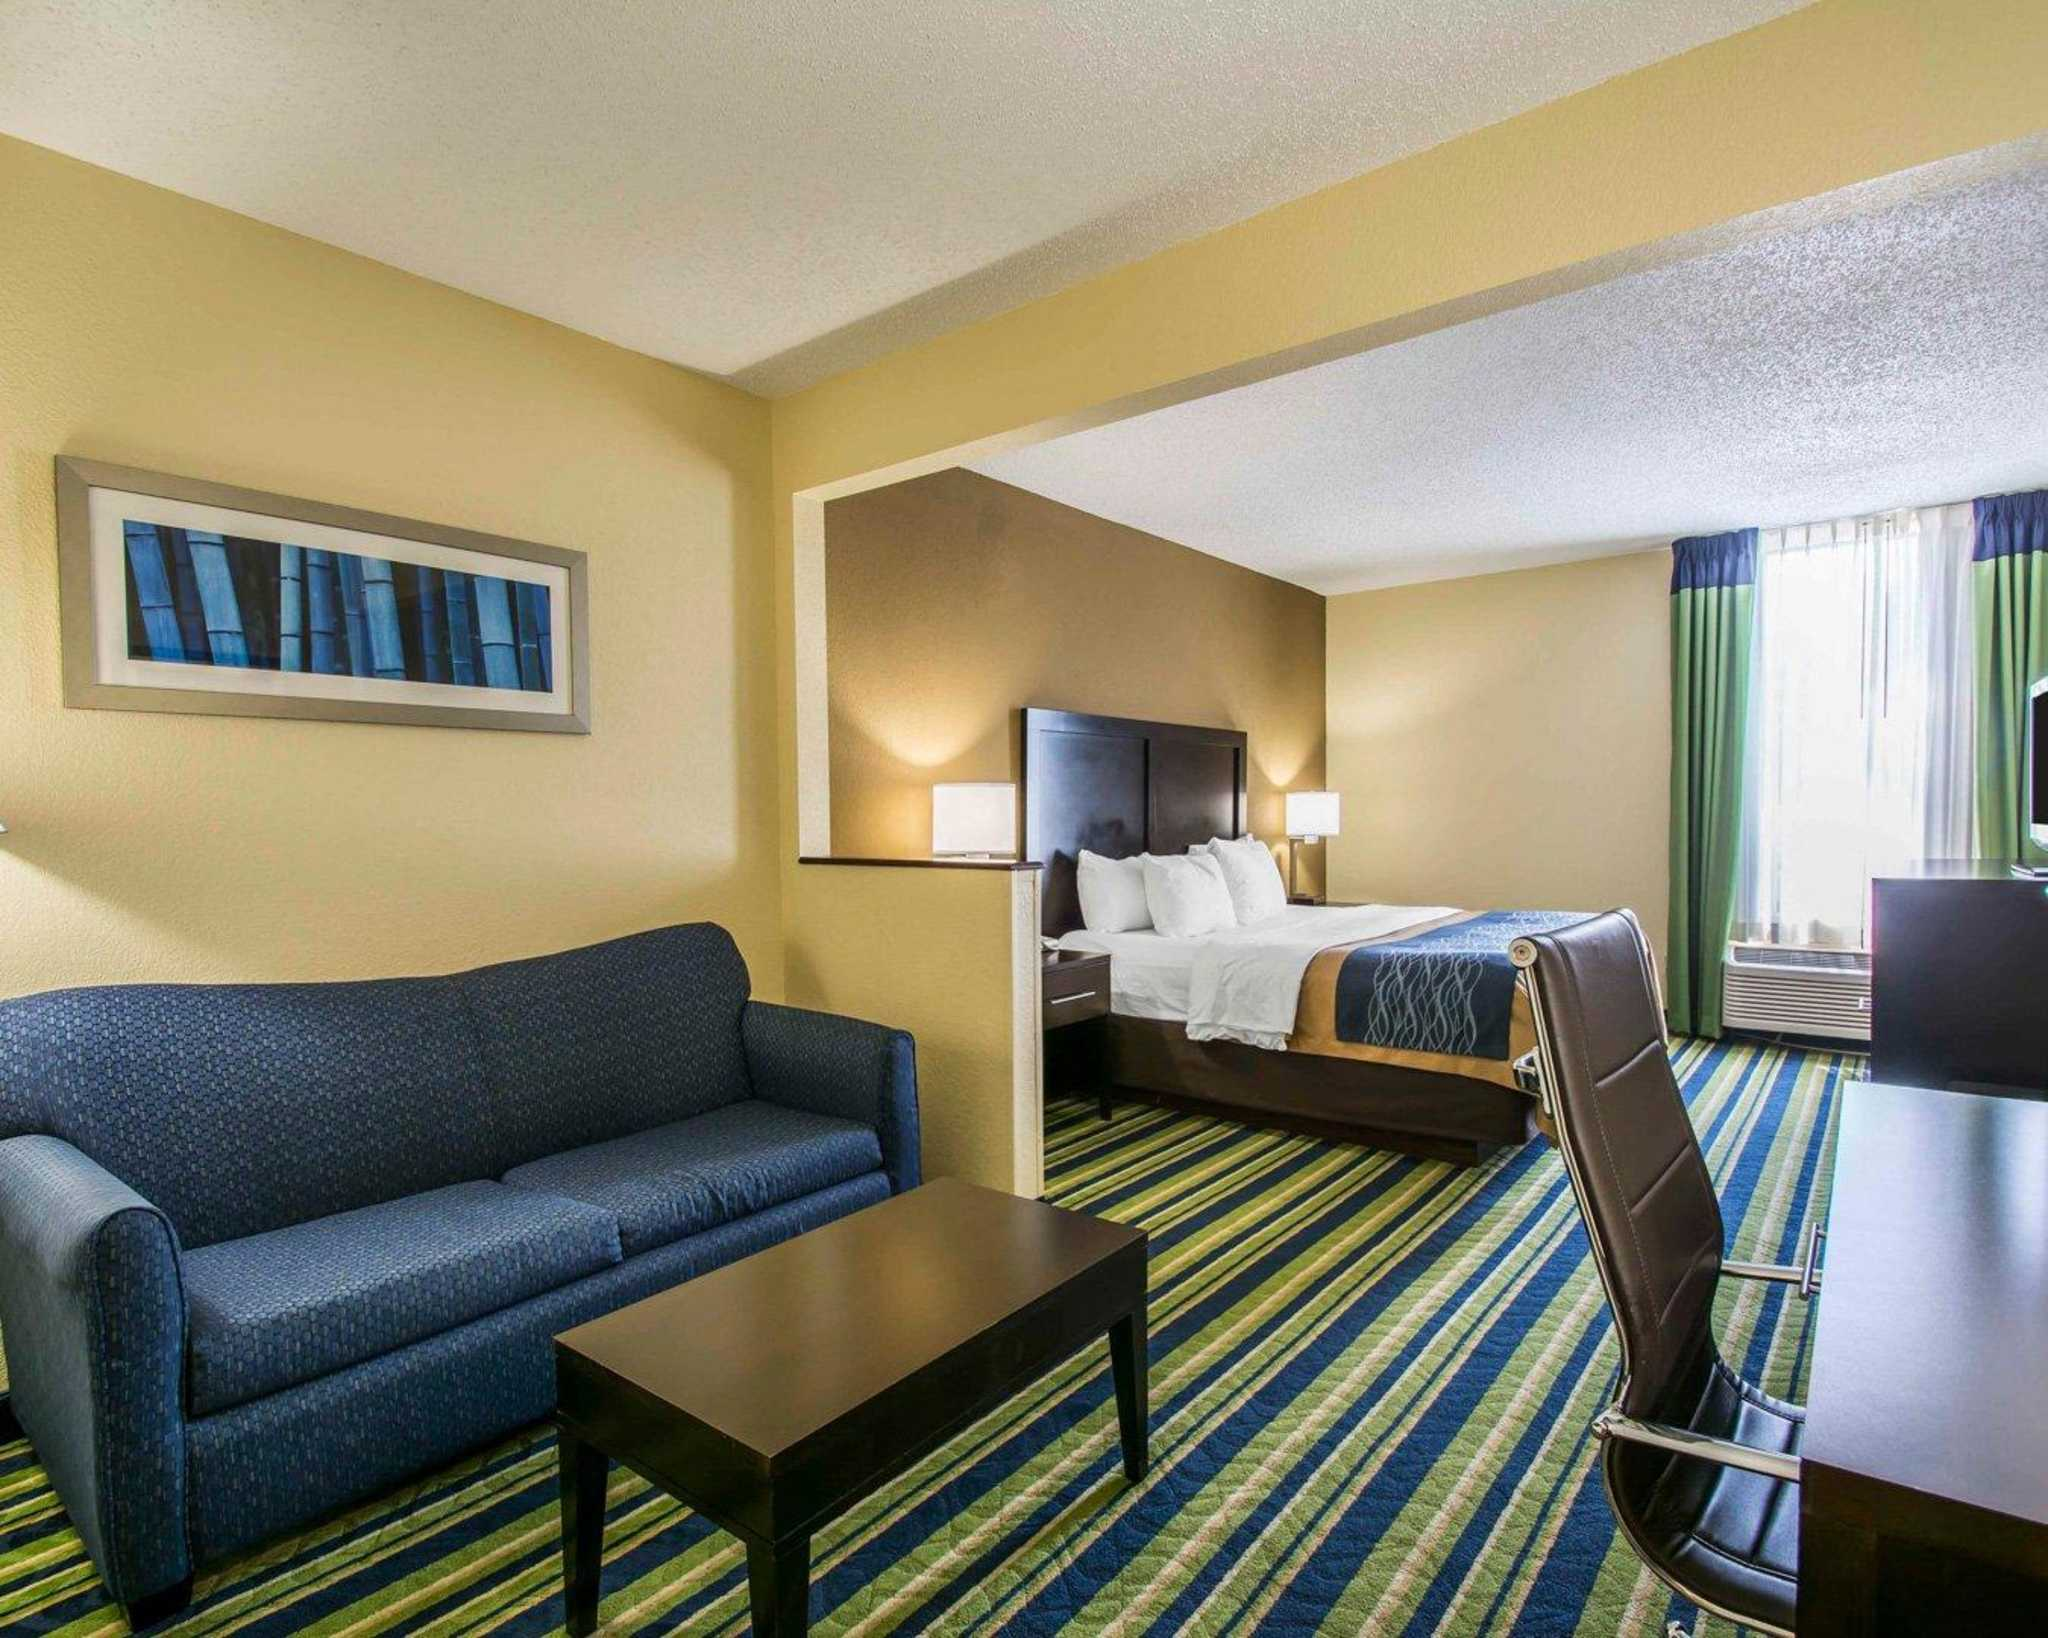 Comfort Inn & Suites Lantana - West Palm Beach South image 24